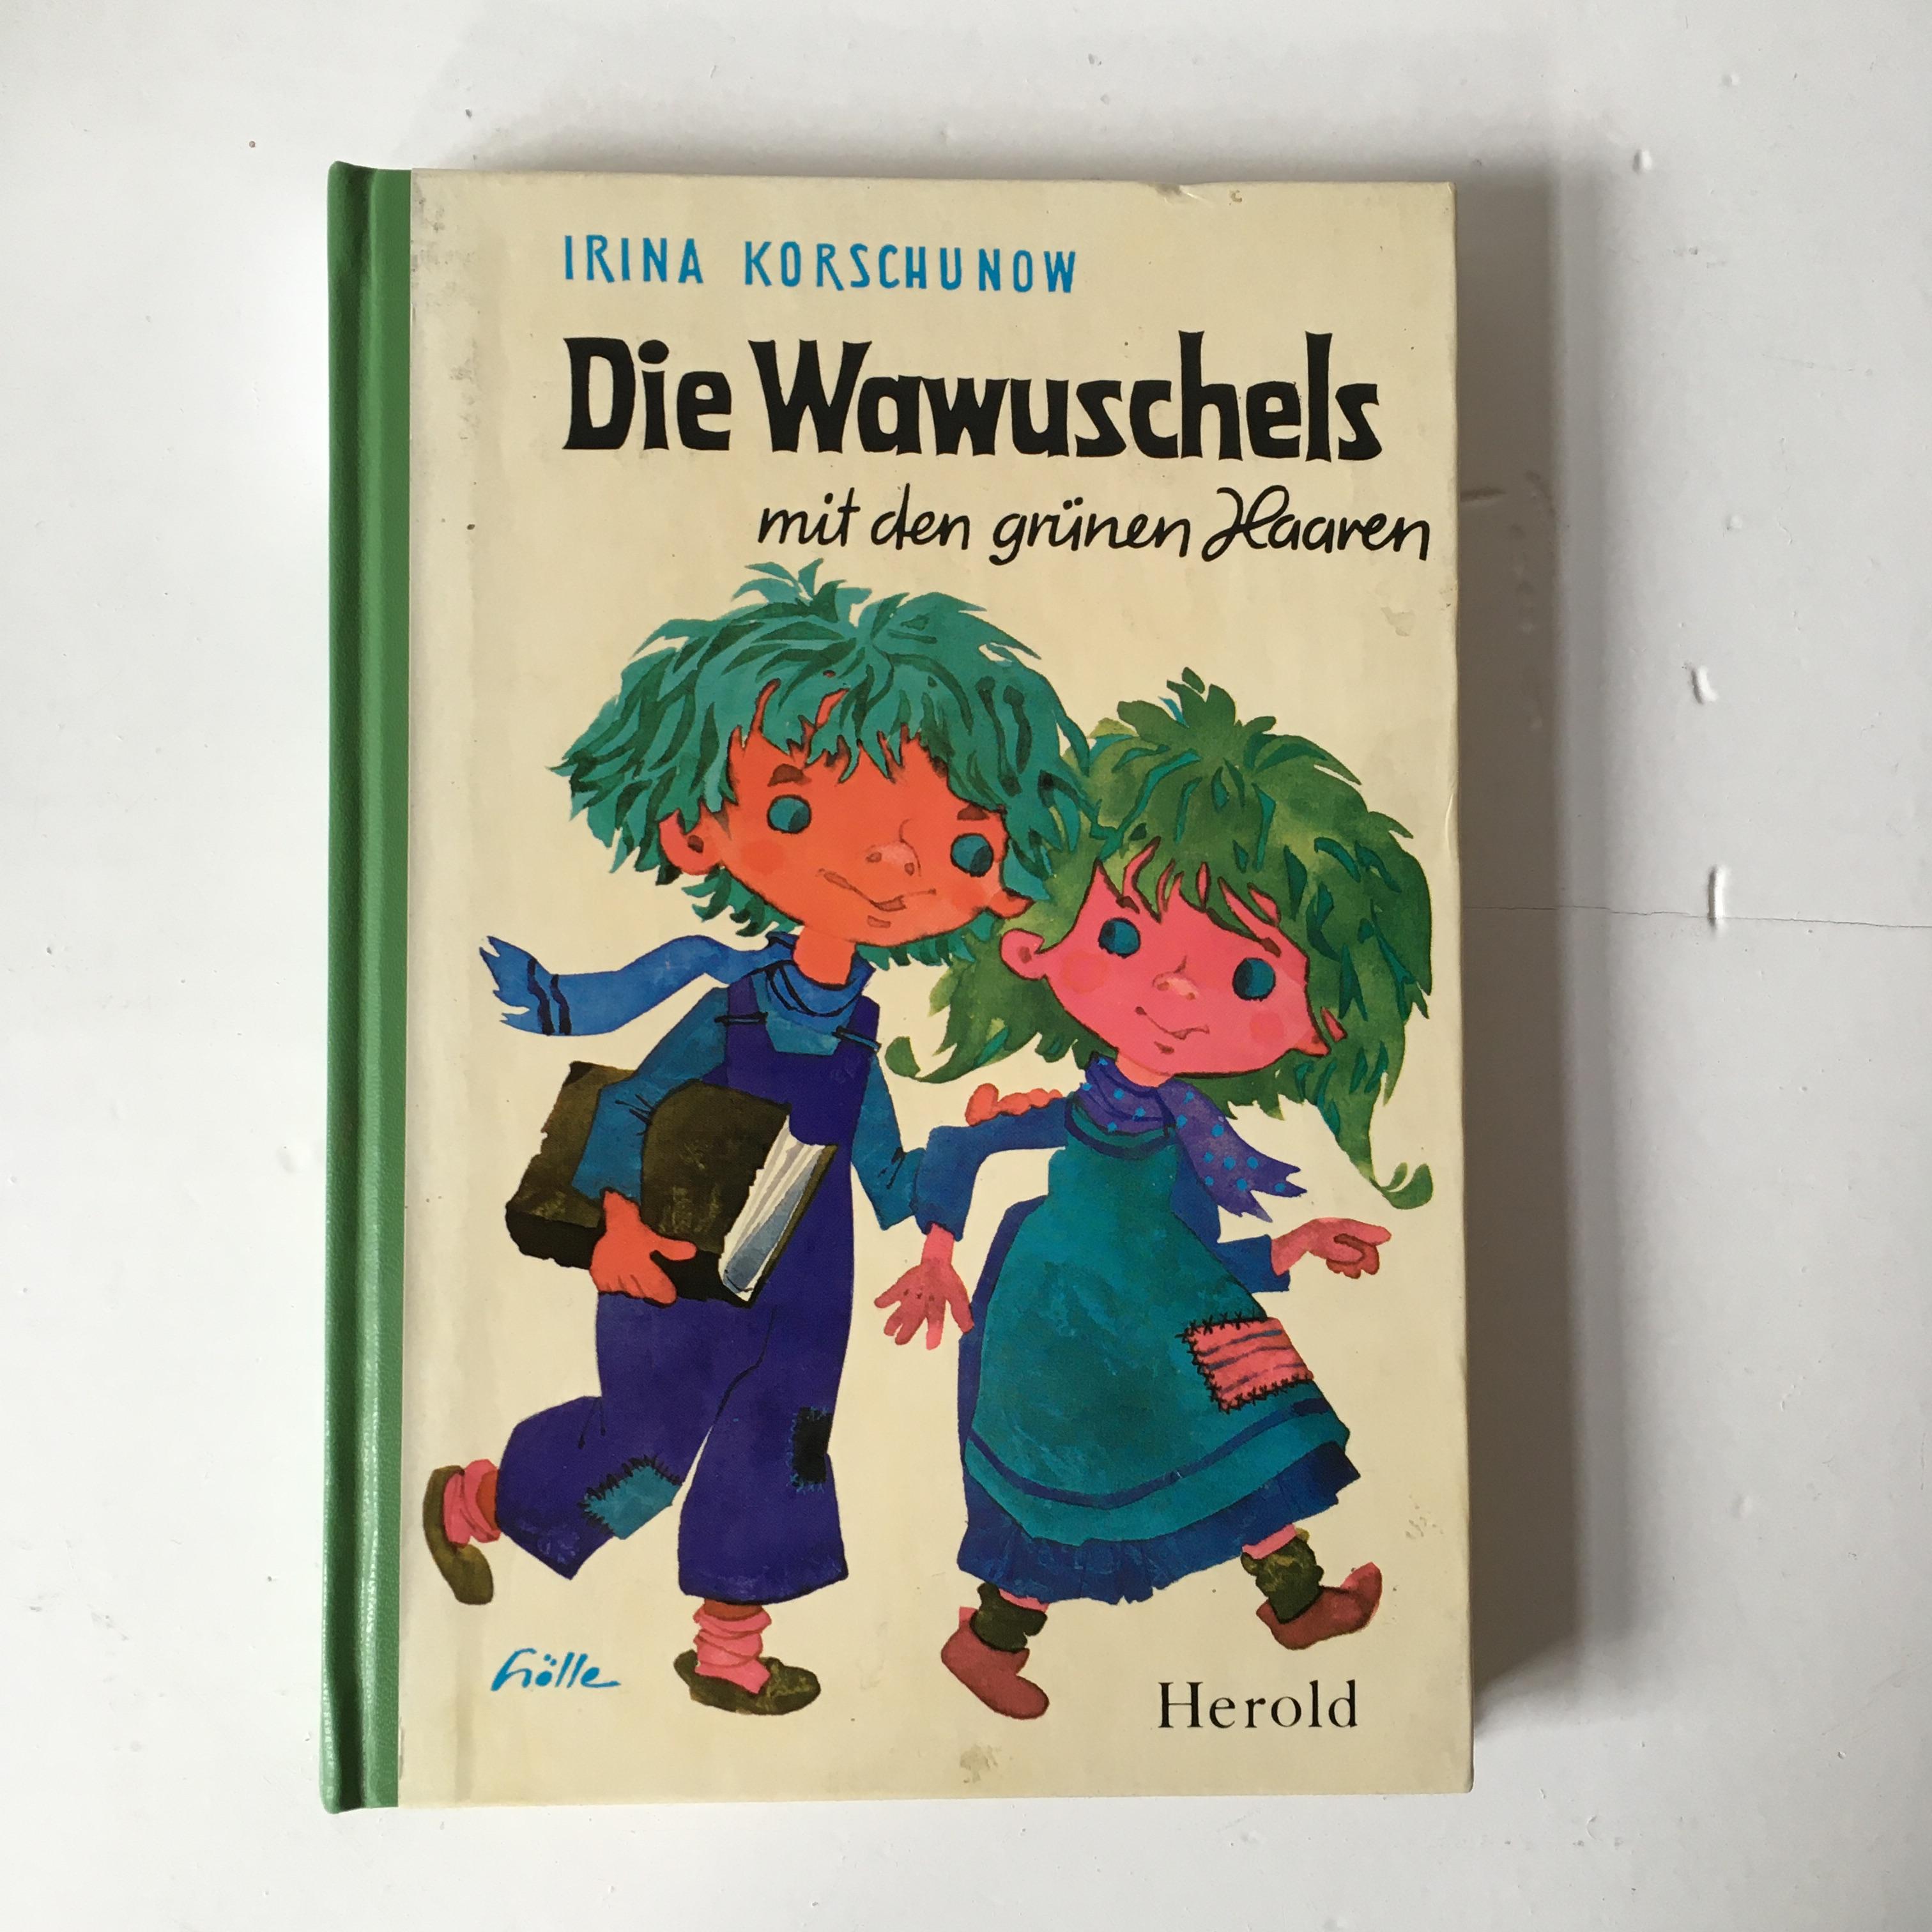 Irina Korschunow, Klassiker, Kinderbuch, Tipp